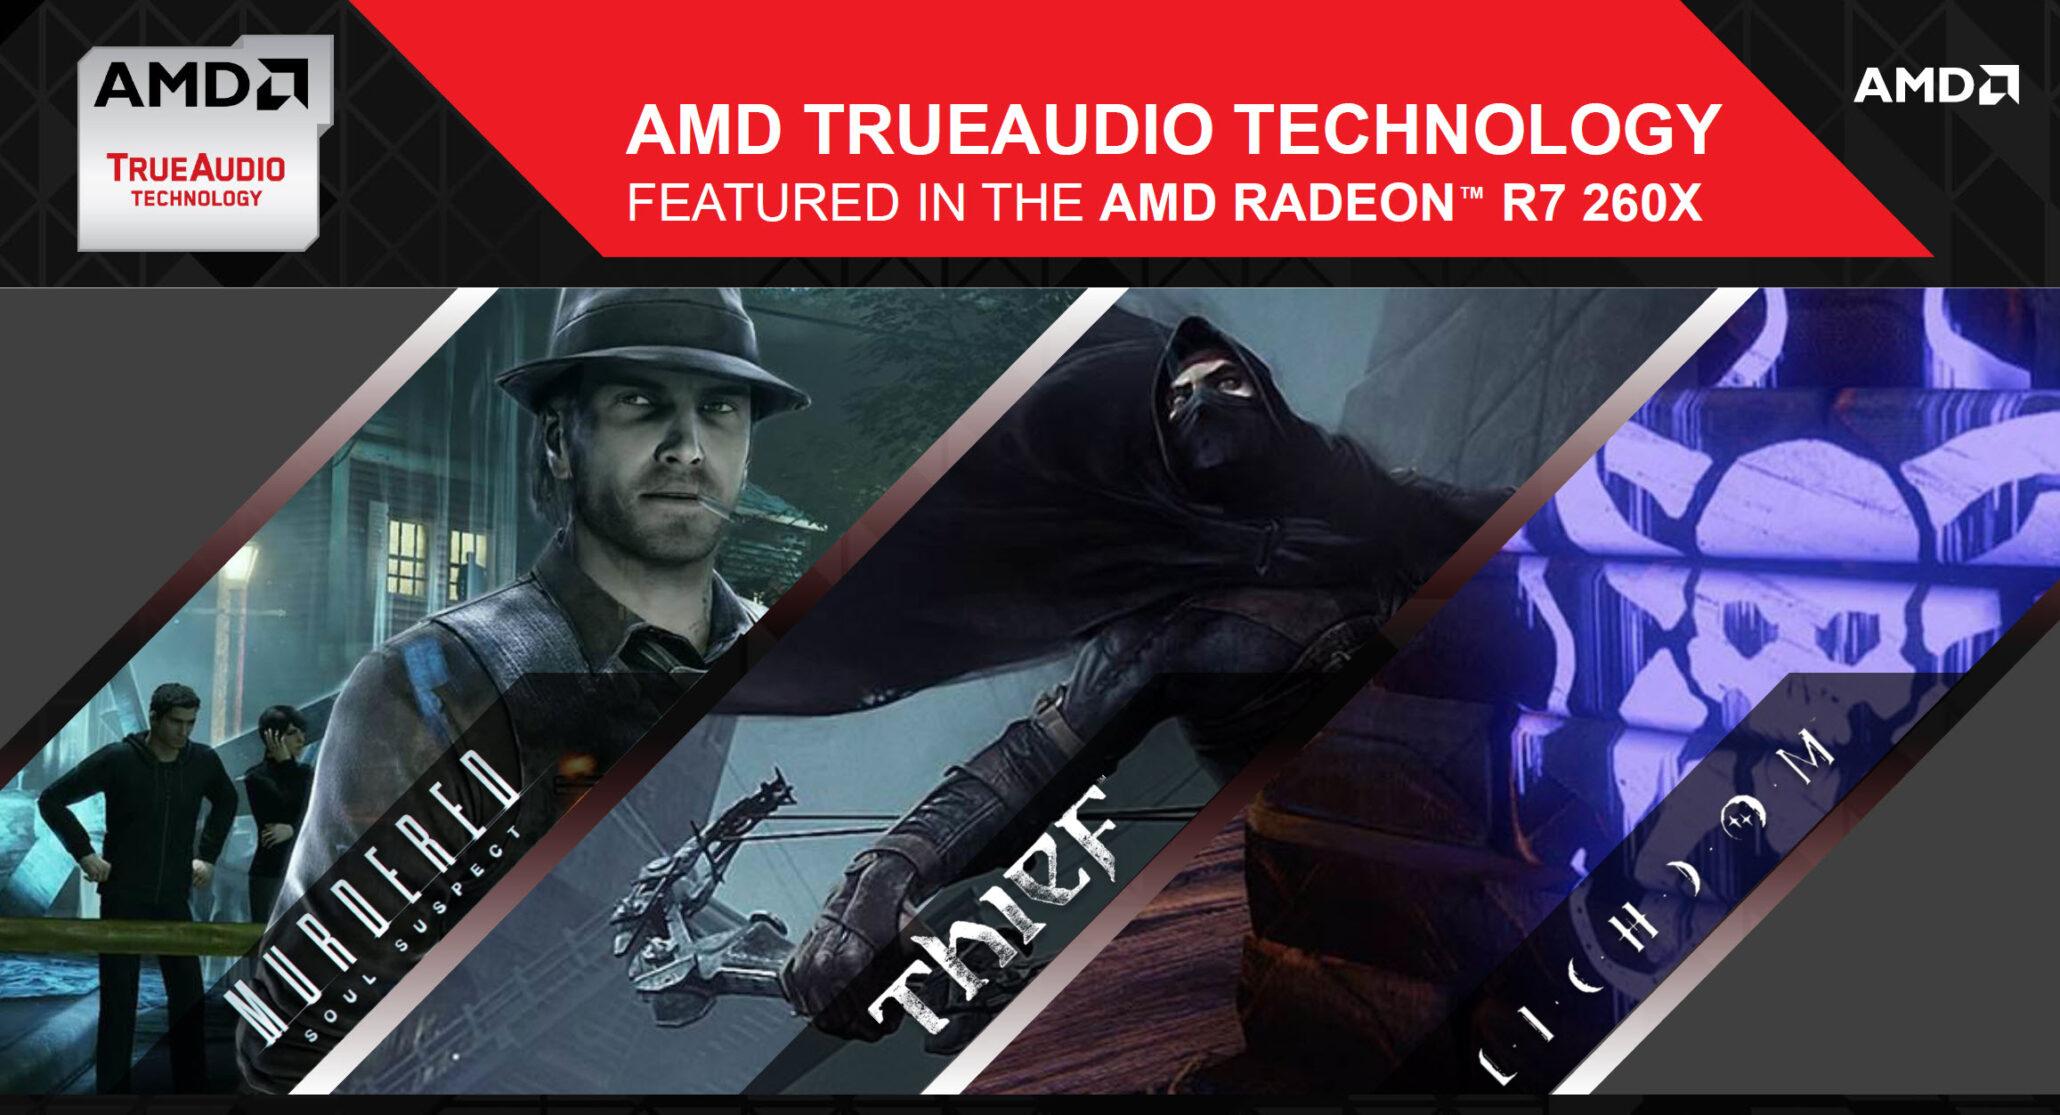 amd-true-audio-technology-r7-260x